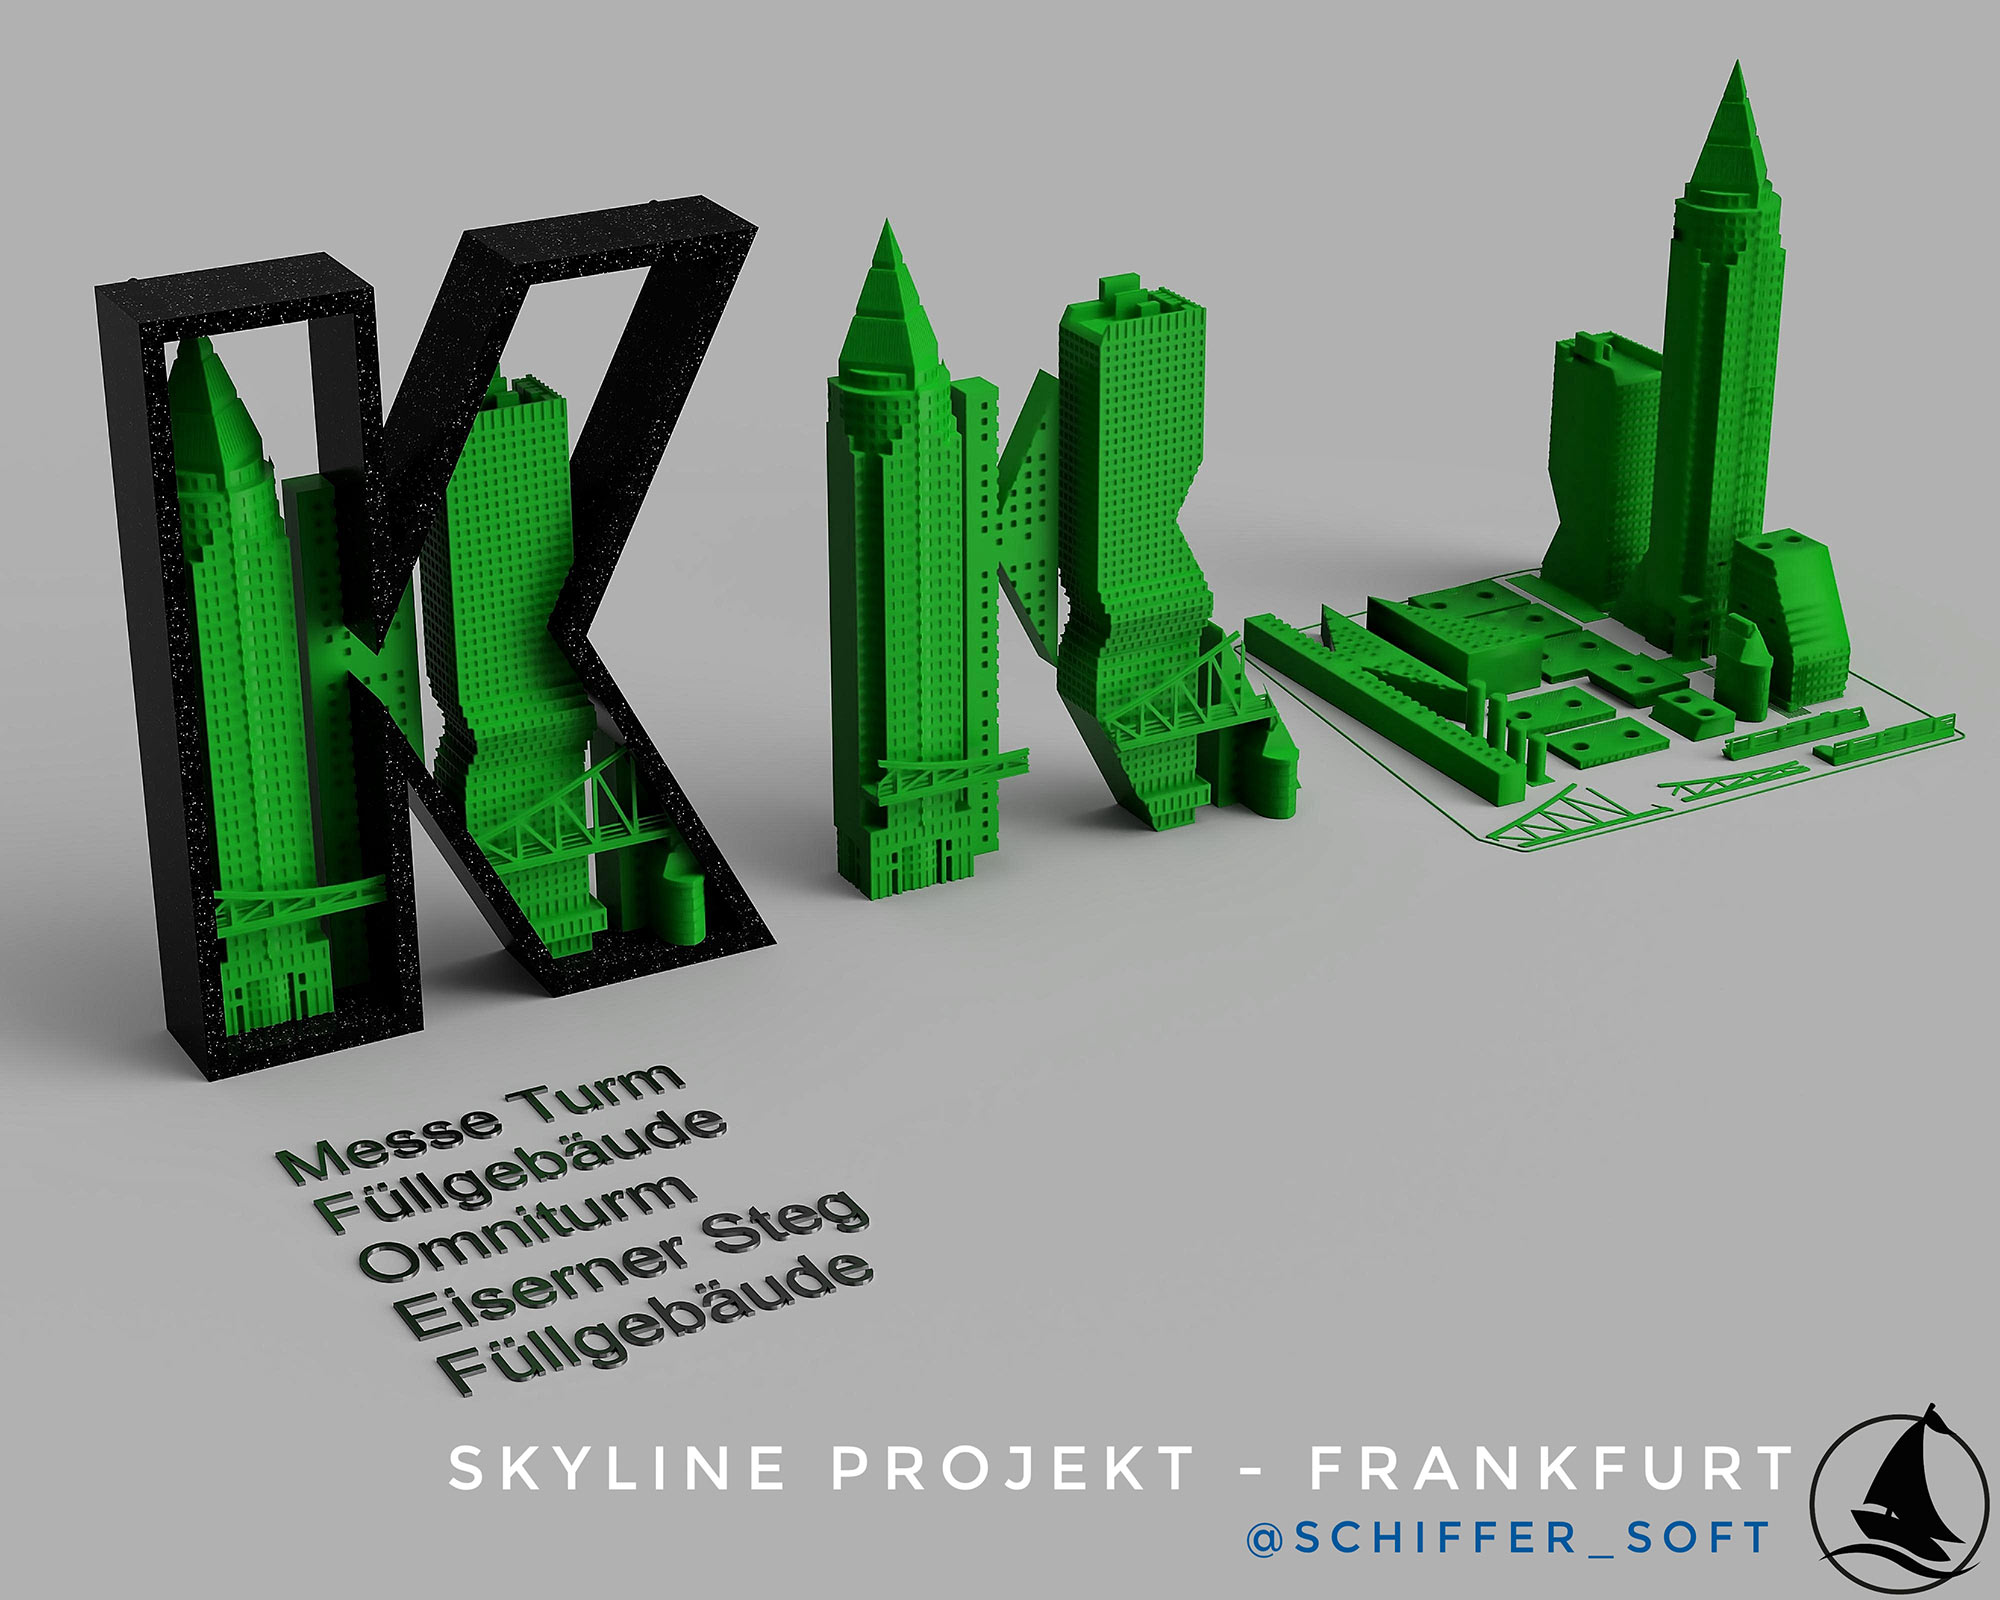 MesseTurm Frankfurt 3D Druck Vorlage - Skyline Frankfurt